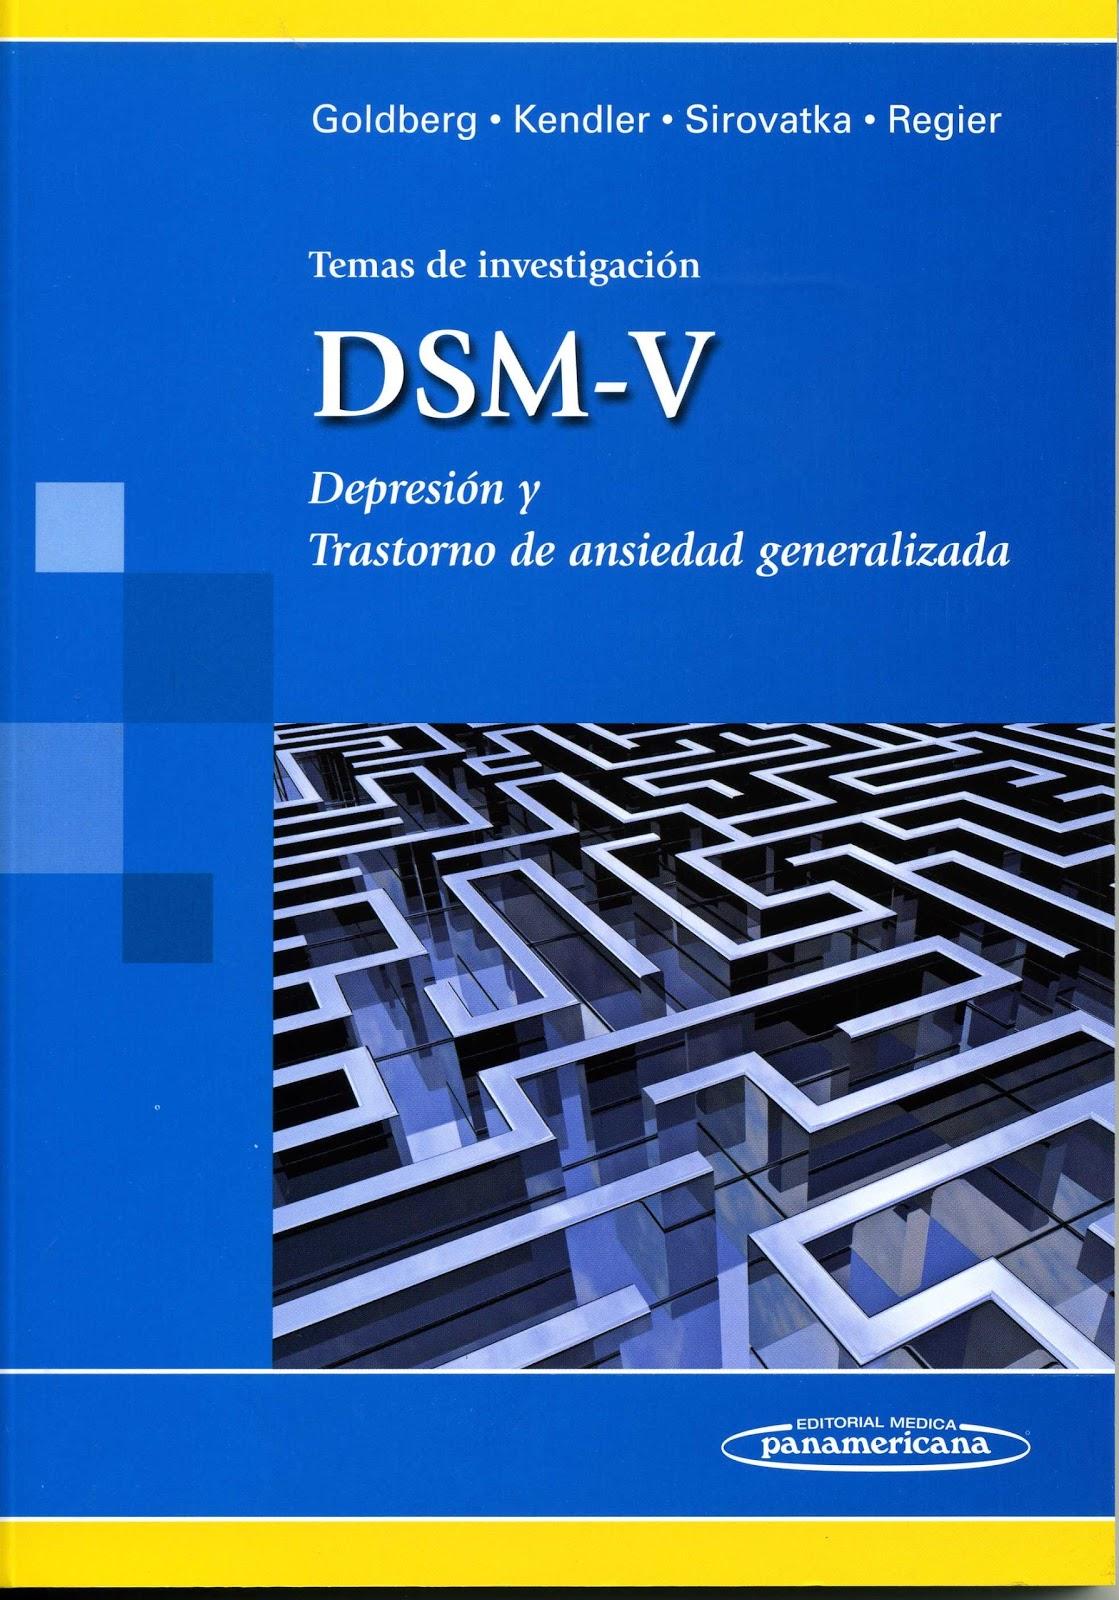 dsm v pdf espanol descargar